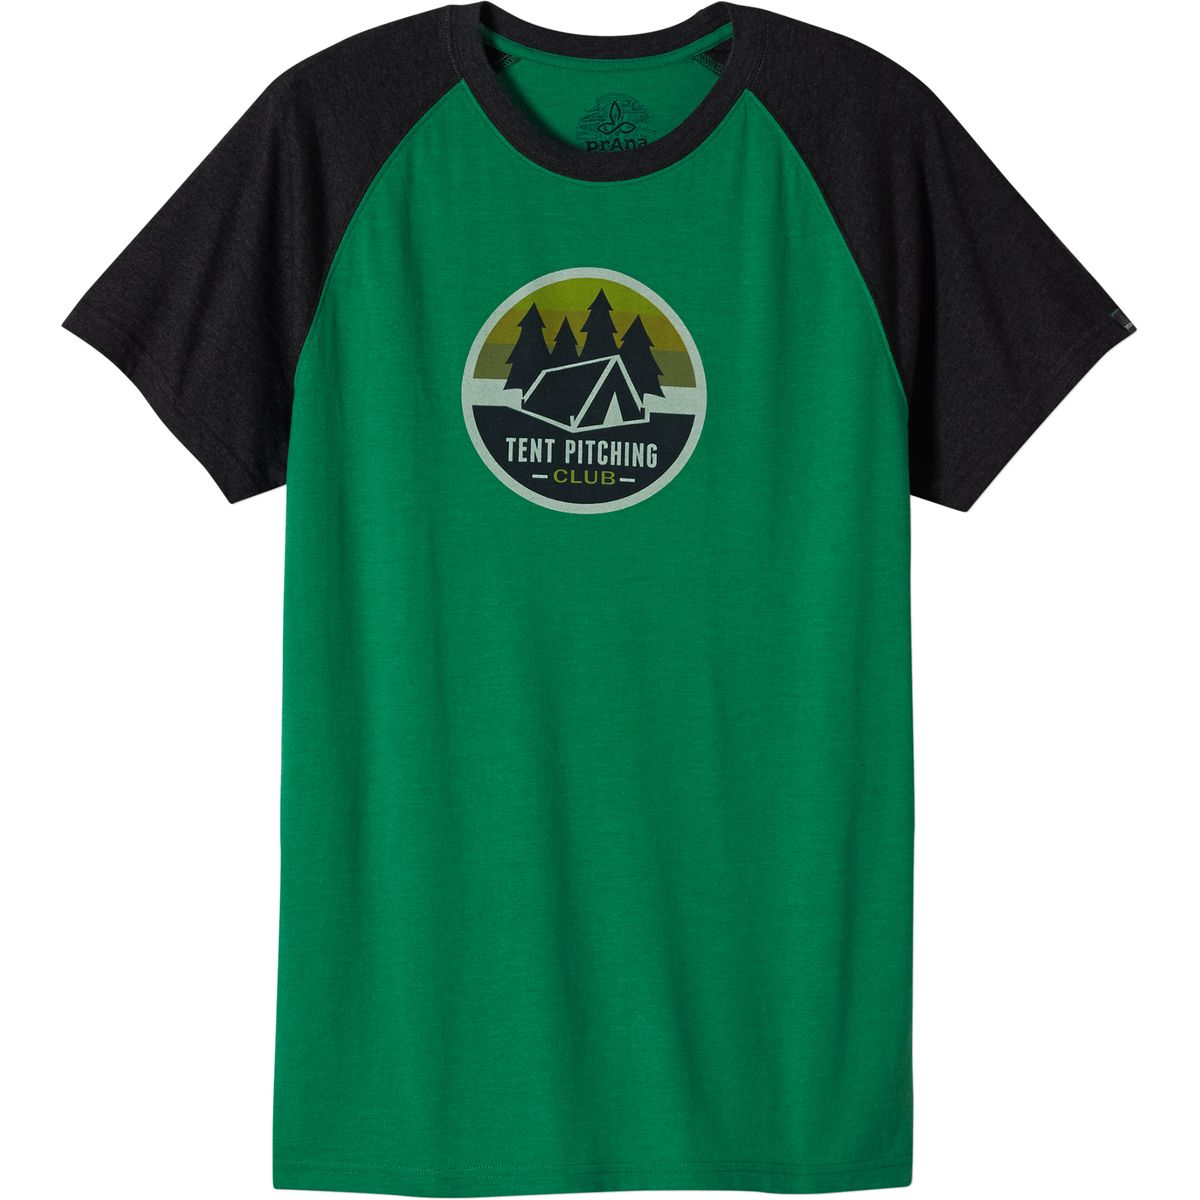 Prana Tent Pitch Club Raglan T-Shirt - Men